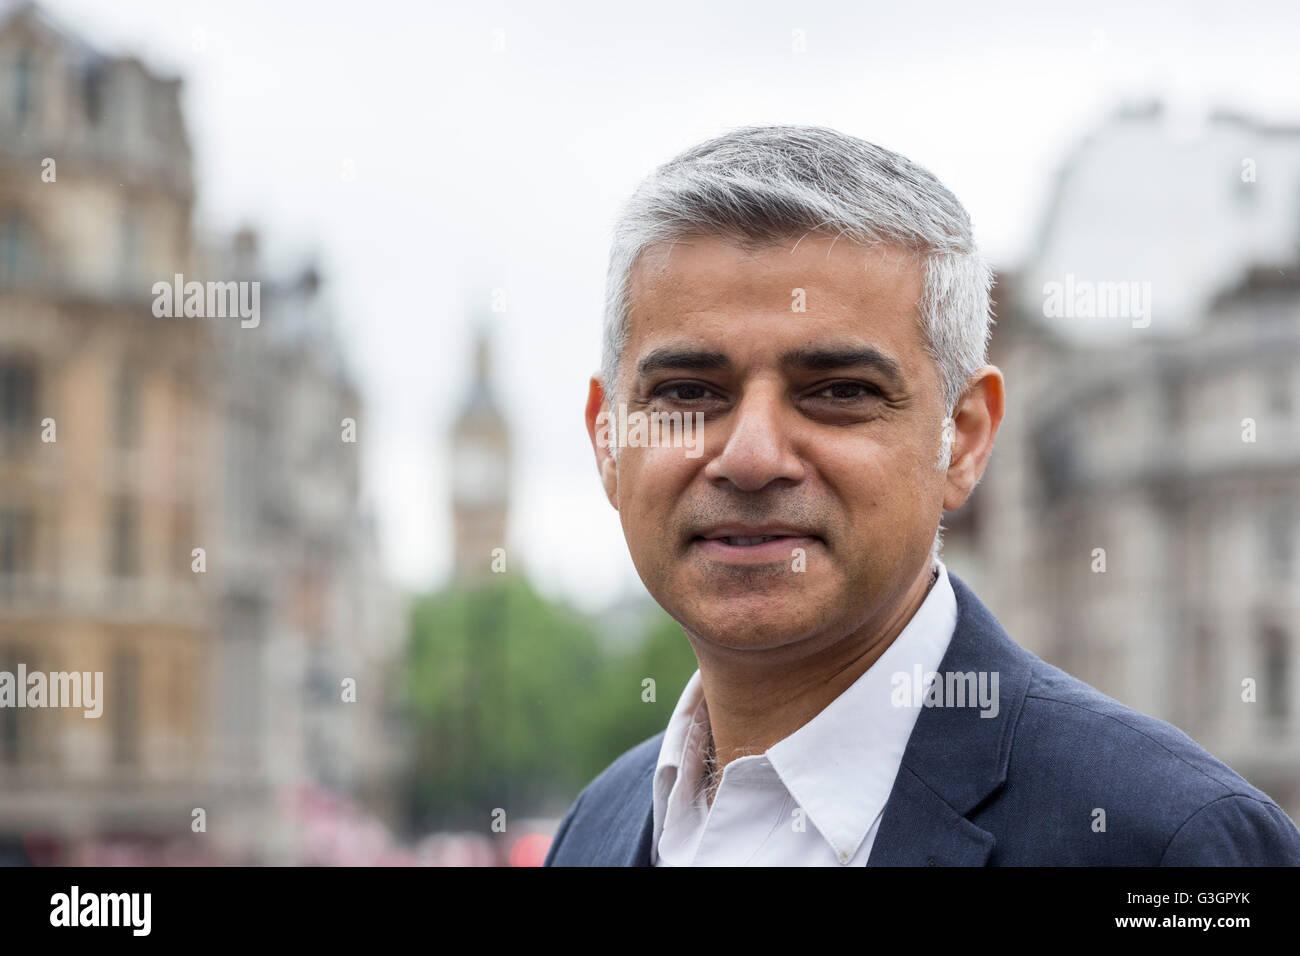 London, UK. 12 June 2016. Sadiq Khan, Mayor of London, British Politician and Member of the Labour Party. Im Hintergrund - Stock Image